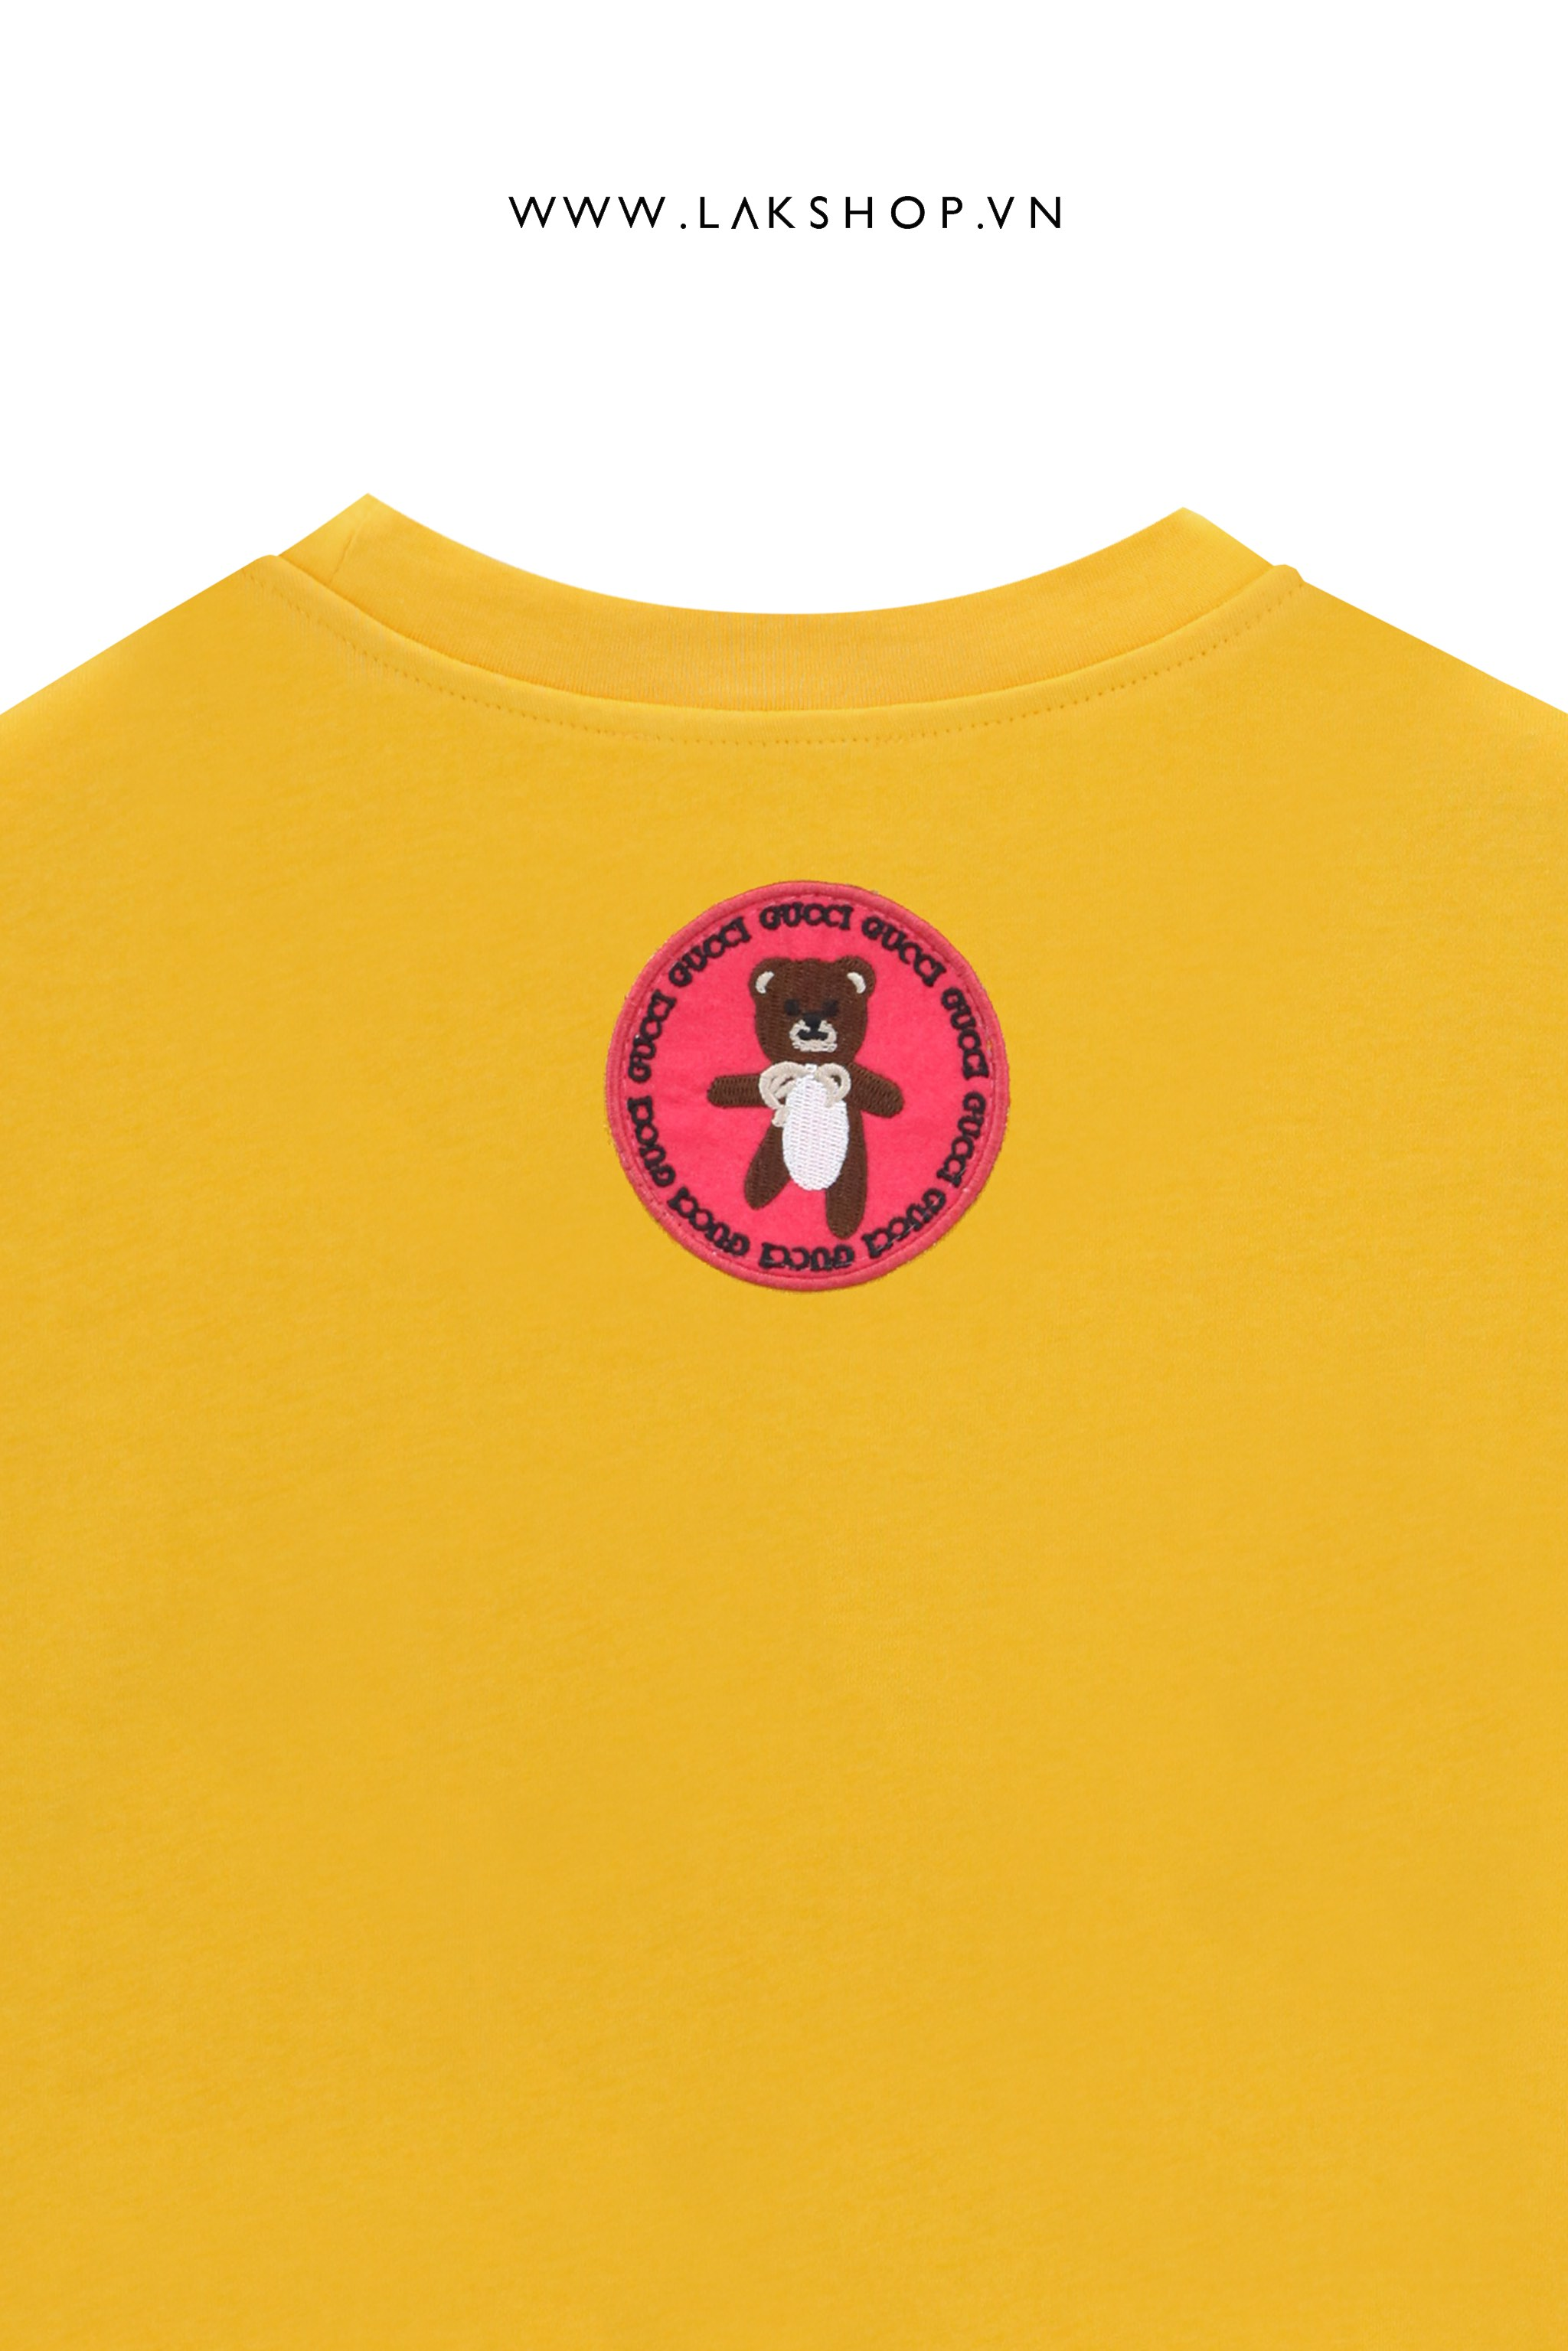 Gucci x Kai Teddy GG Lock Logo Yellow Oversized T-shirt cv1